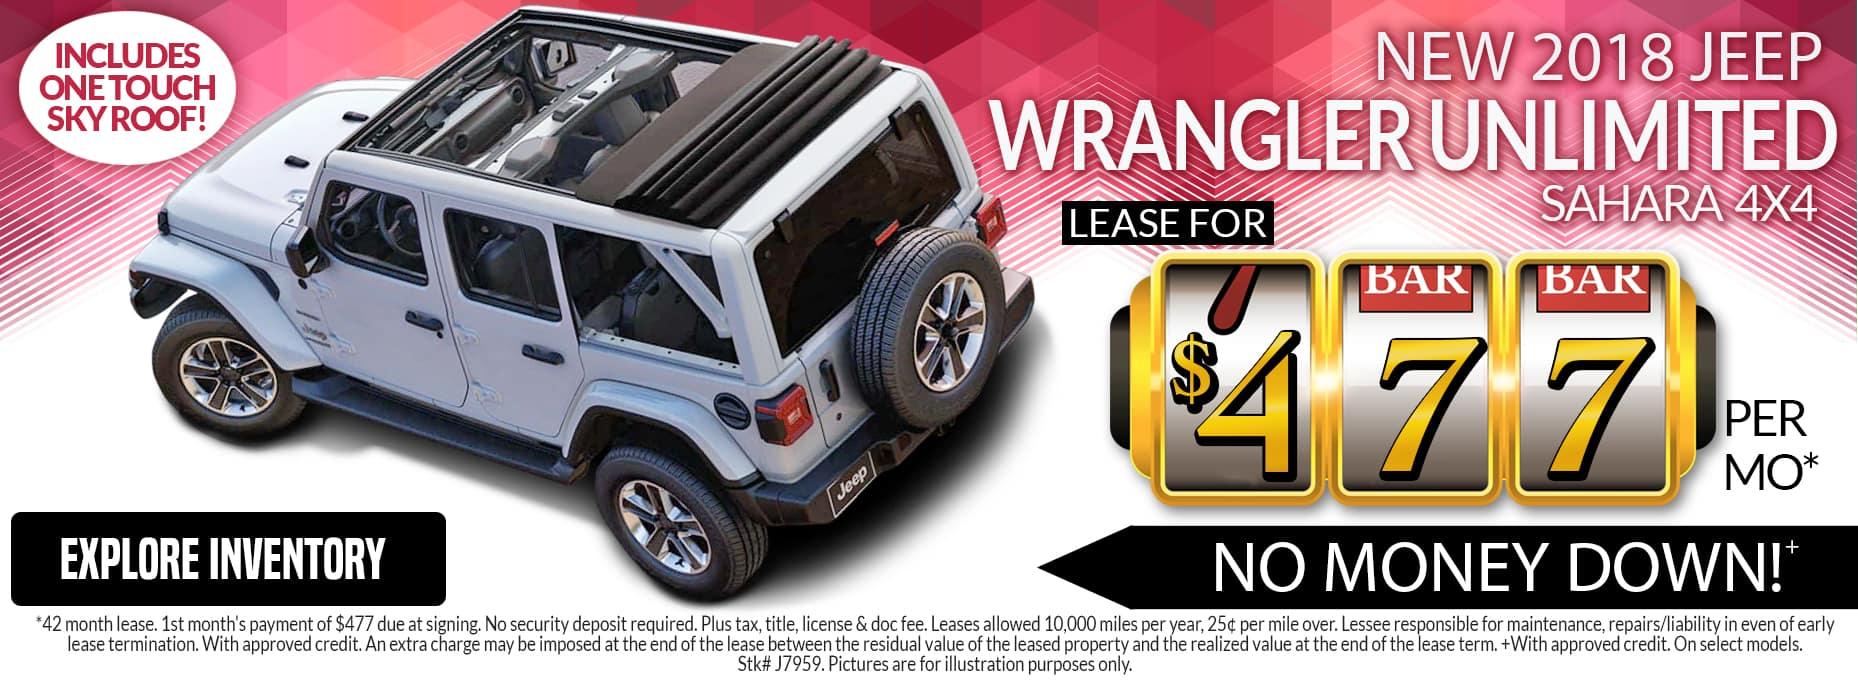 St. Chales 2019 Jeep Wrangler